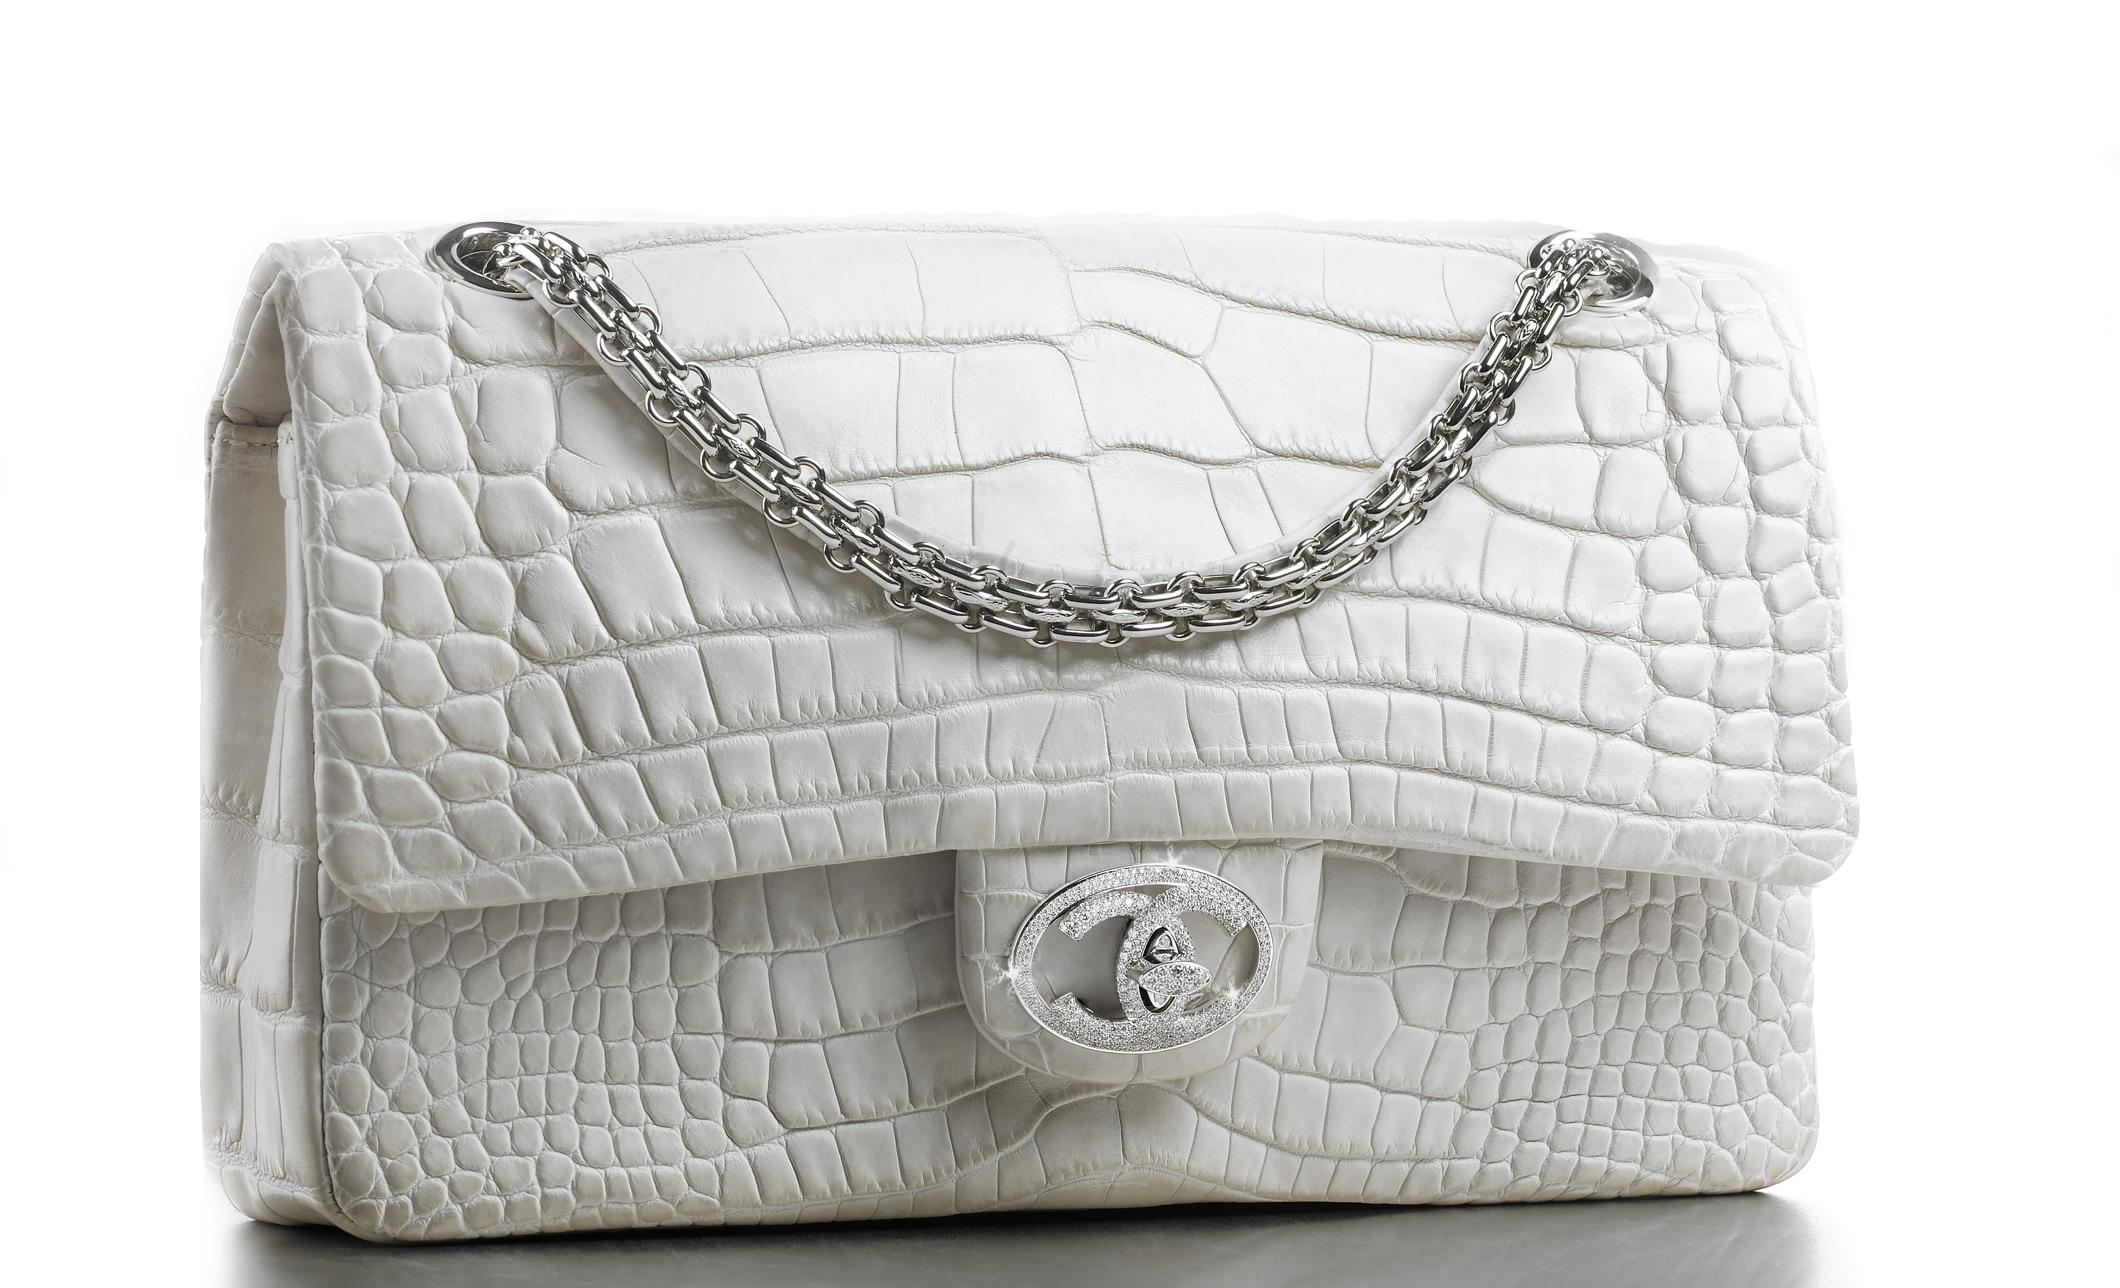 Сумка Chanel Dіamond Forever - $ 261 тысяч